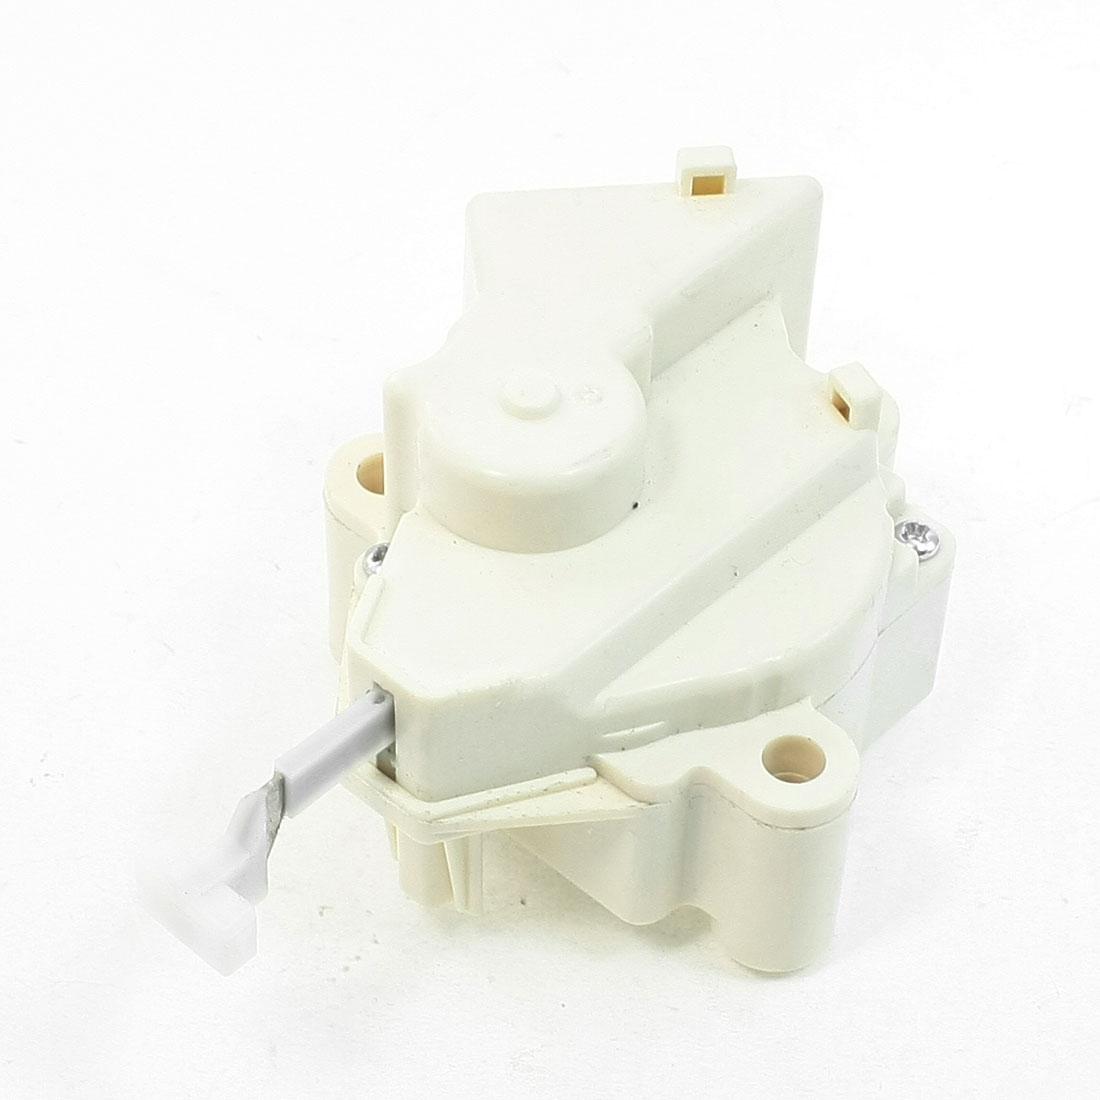 AC 220V 50Hz Off White Drain Valve Motor Tractor for Haier Washing Machine